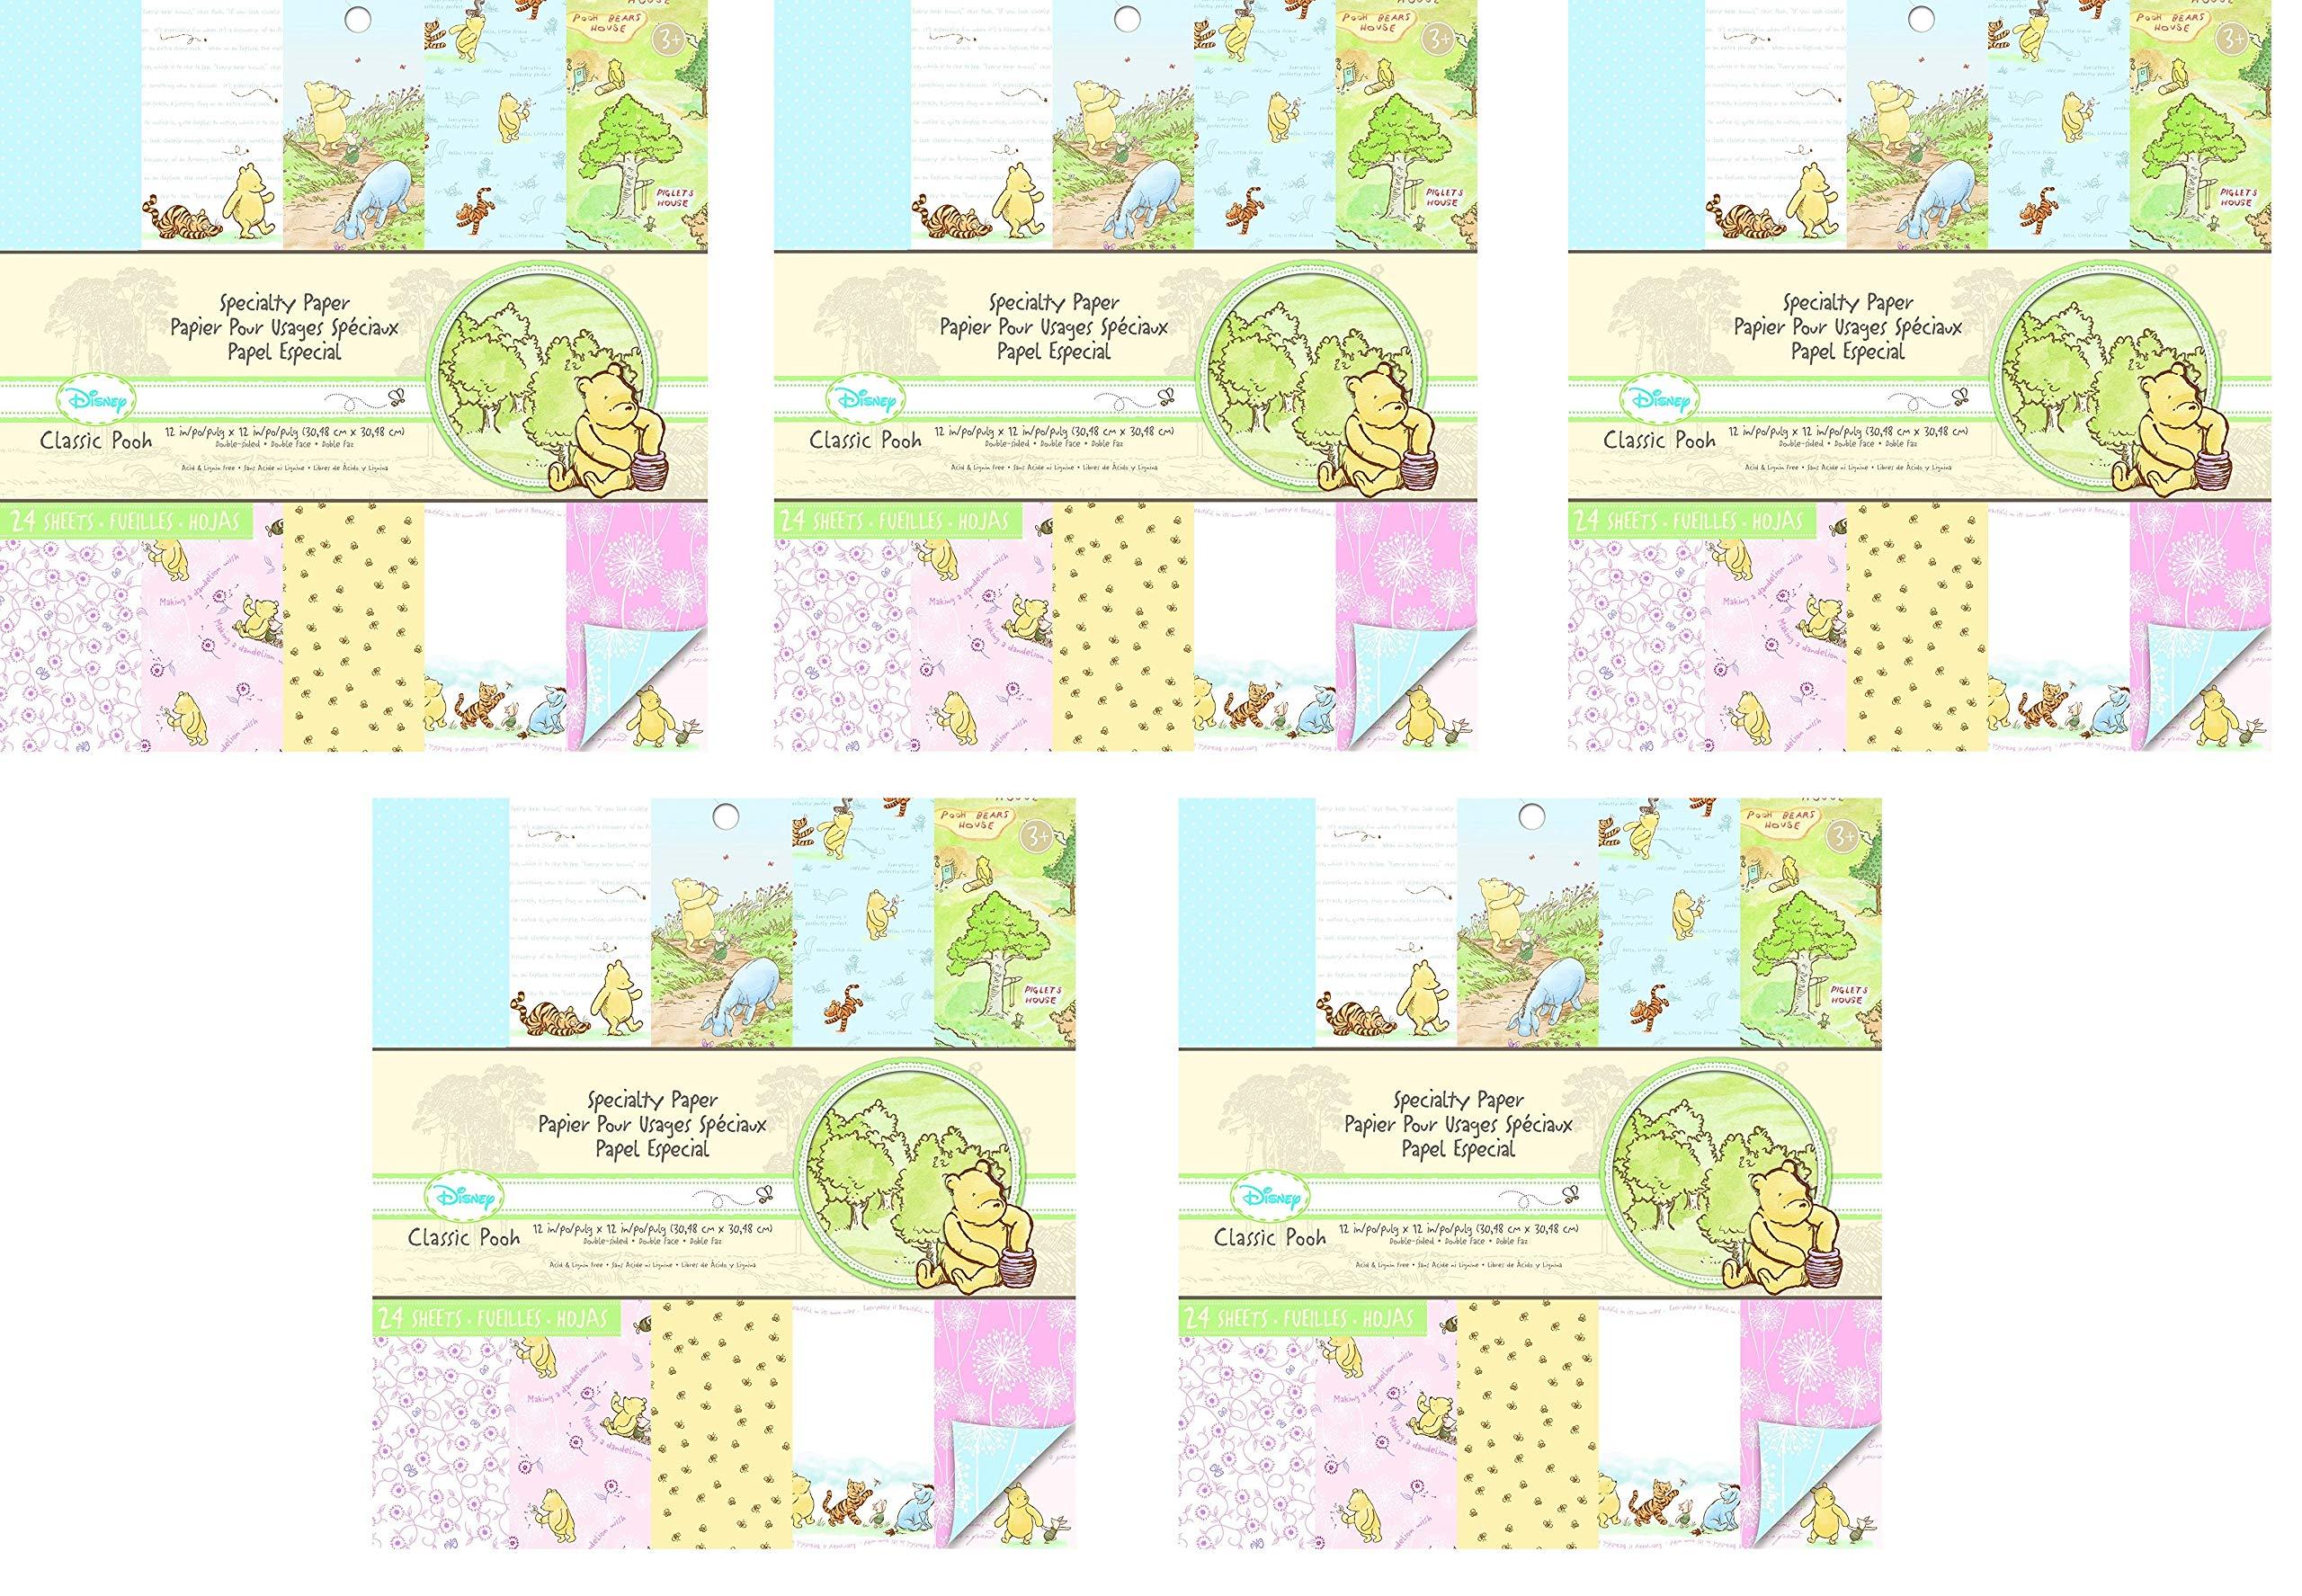 EK Success Brands Disney Specialty Paper Pad, Classic Pooh (Fivе Расk)